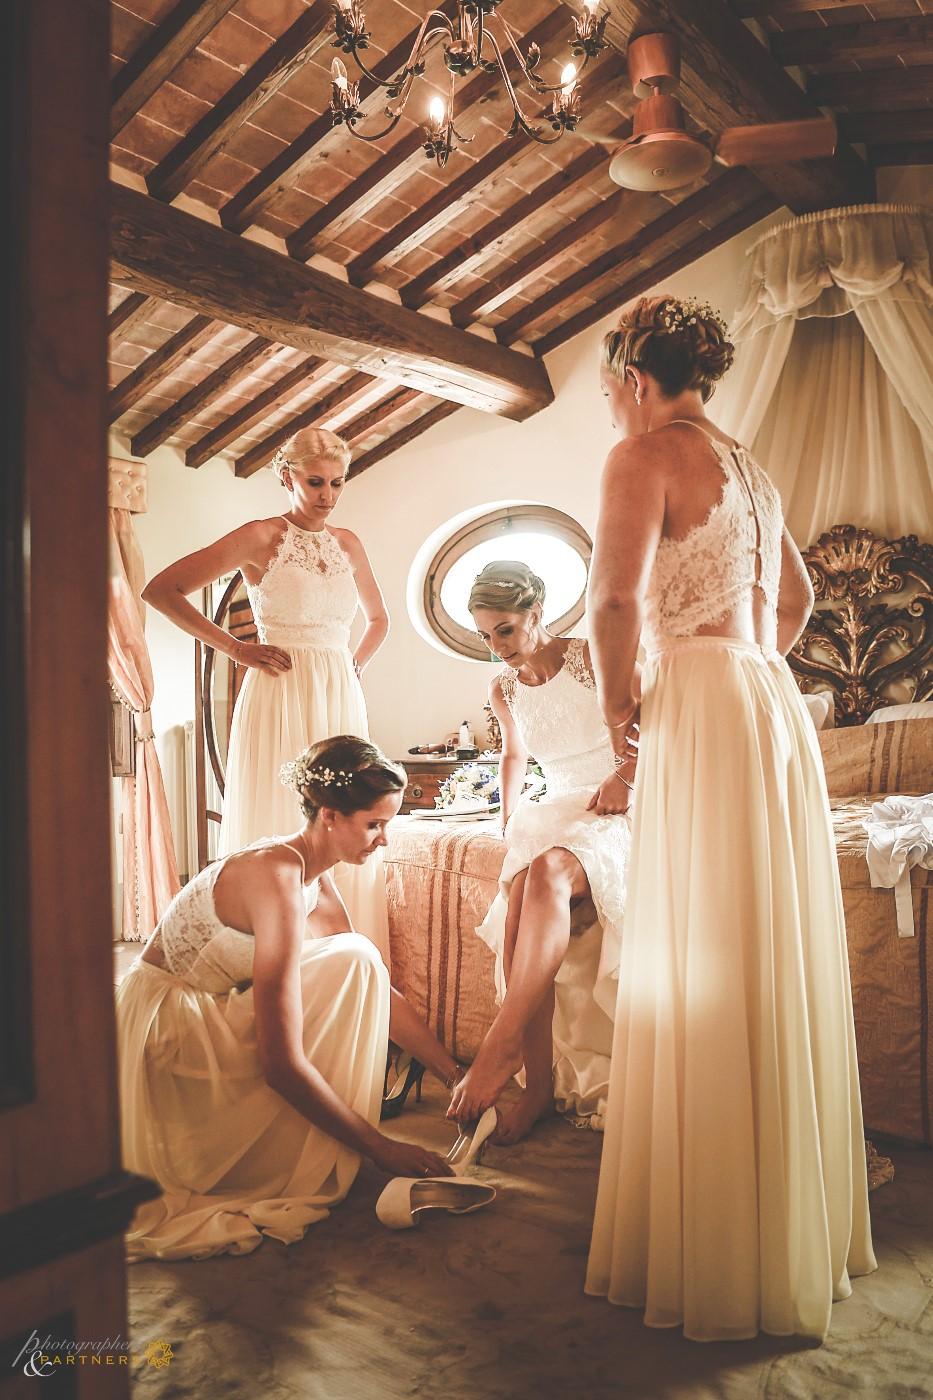 🌼 Bridal preparations 🌼